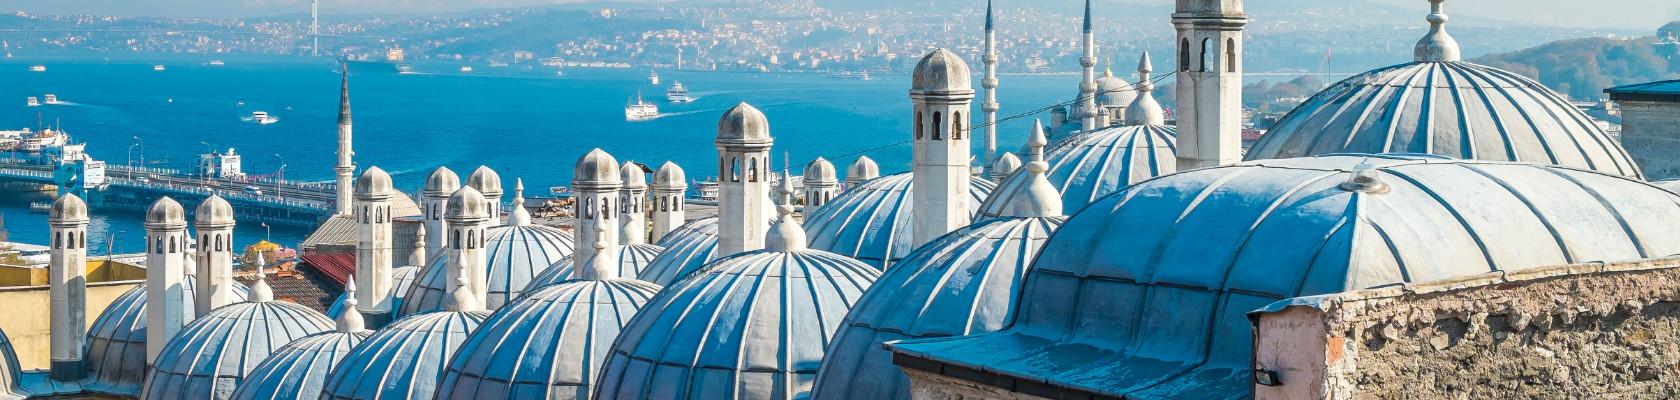 ISTANBUL DELUXE - 5 DANA AVIONOM